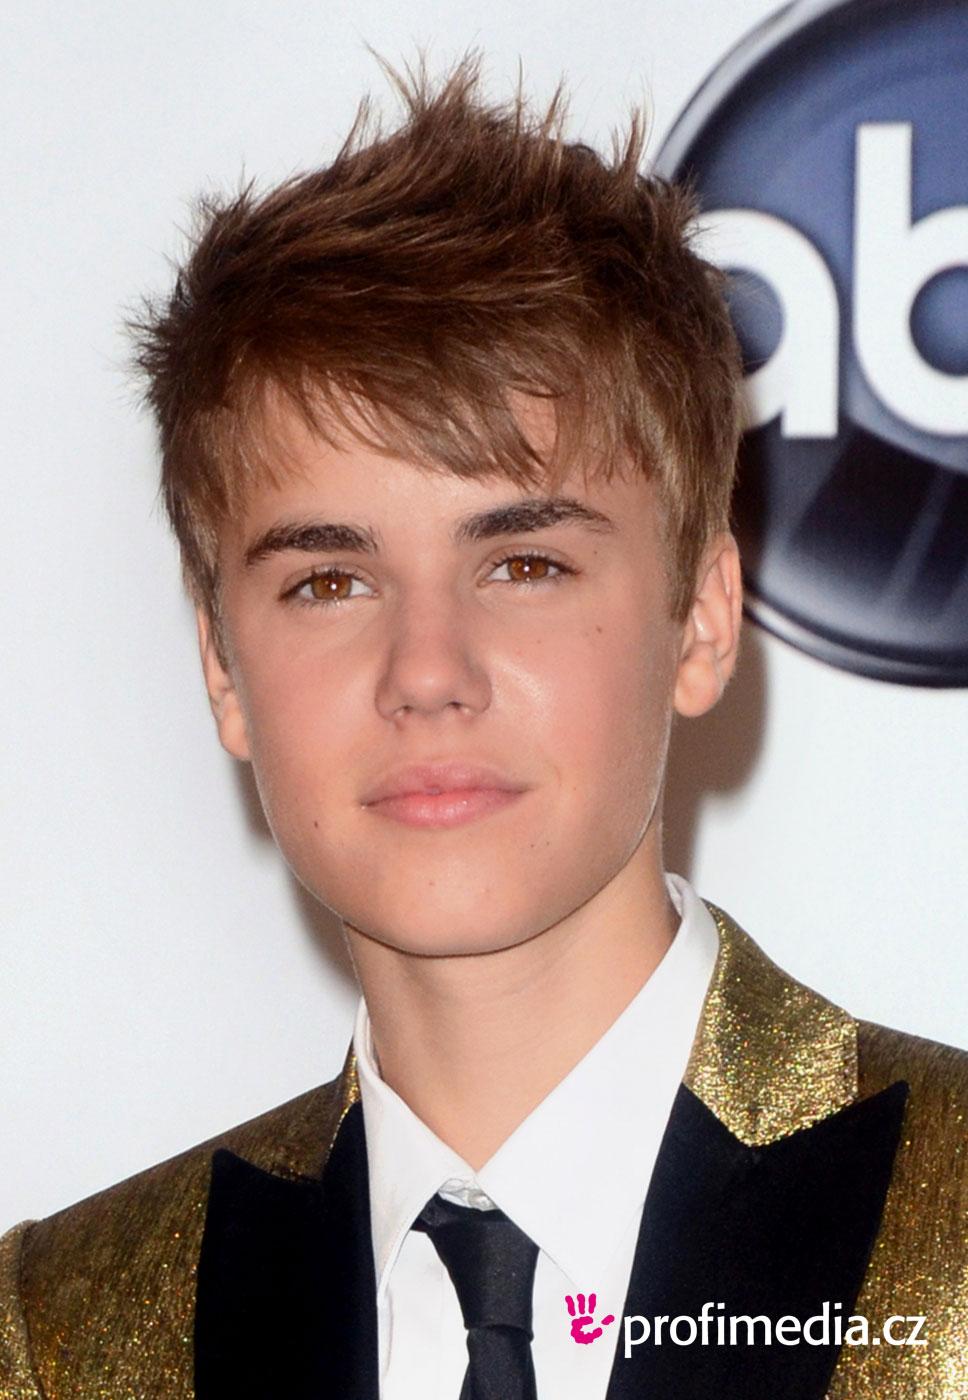 Fácil peinados de justin bieber Fotos de cortes de pelo estilo - Justin Bieber - peinado de